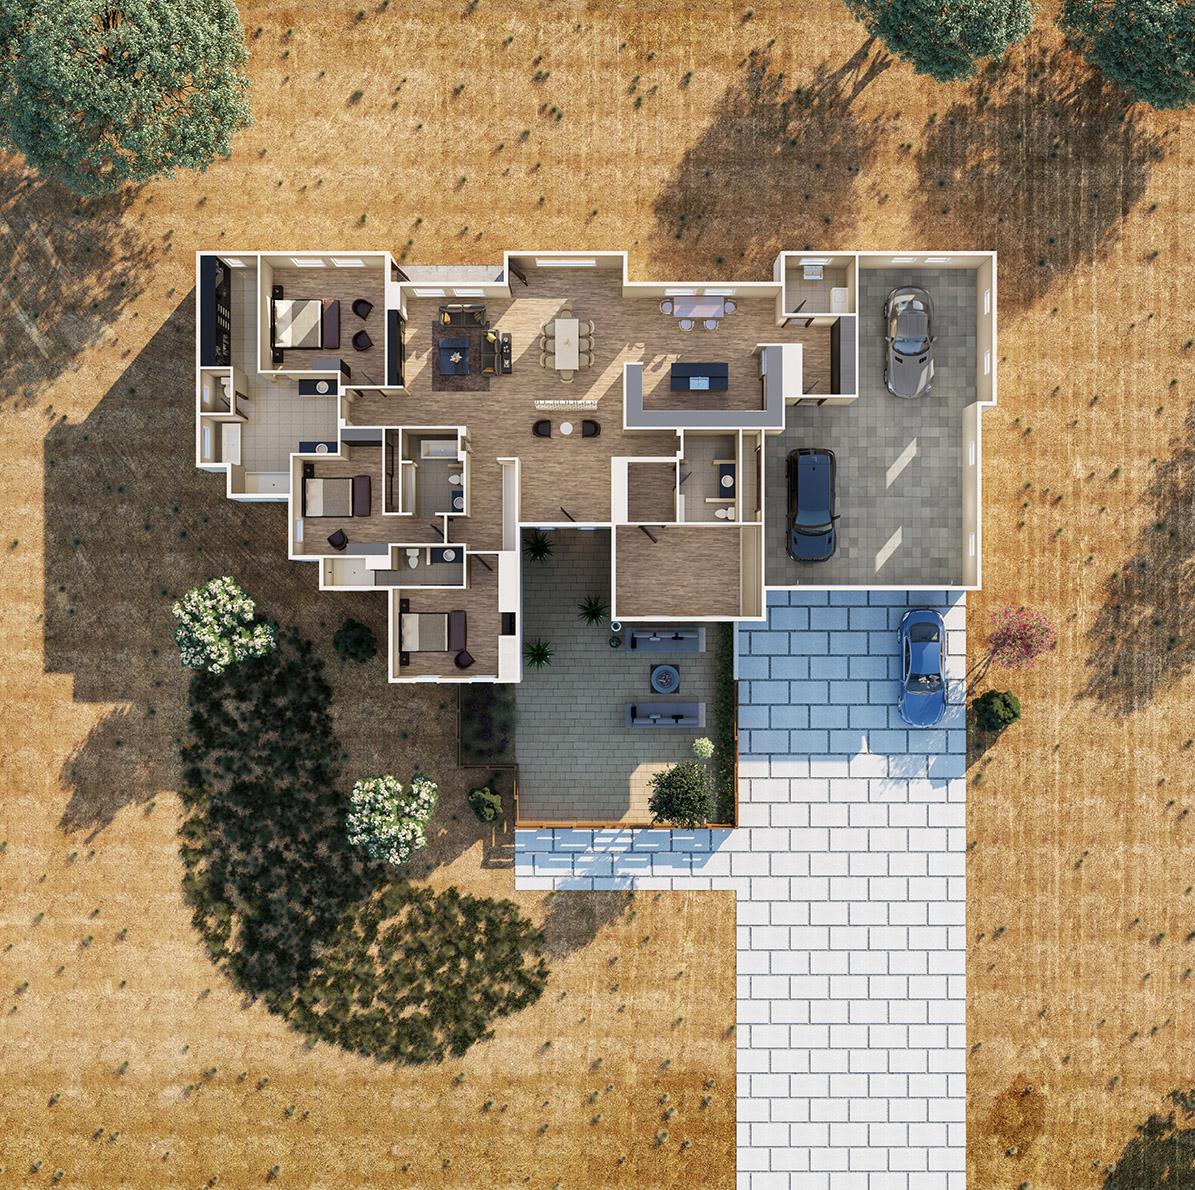 LOT 11 floorplan.jpg